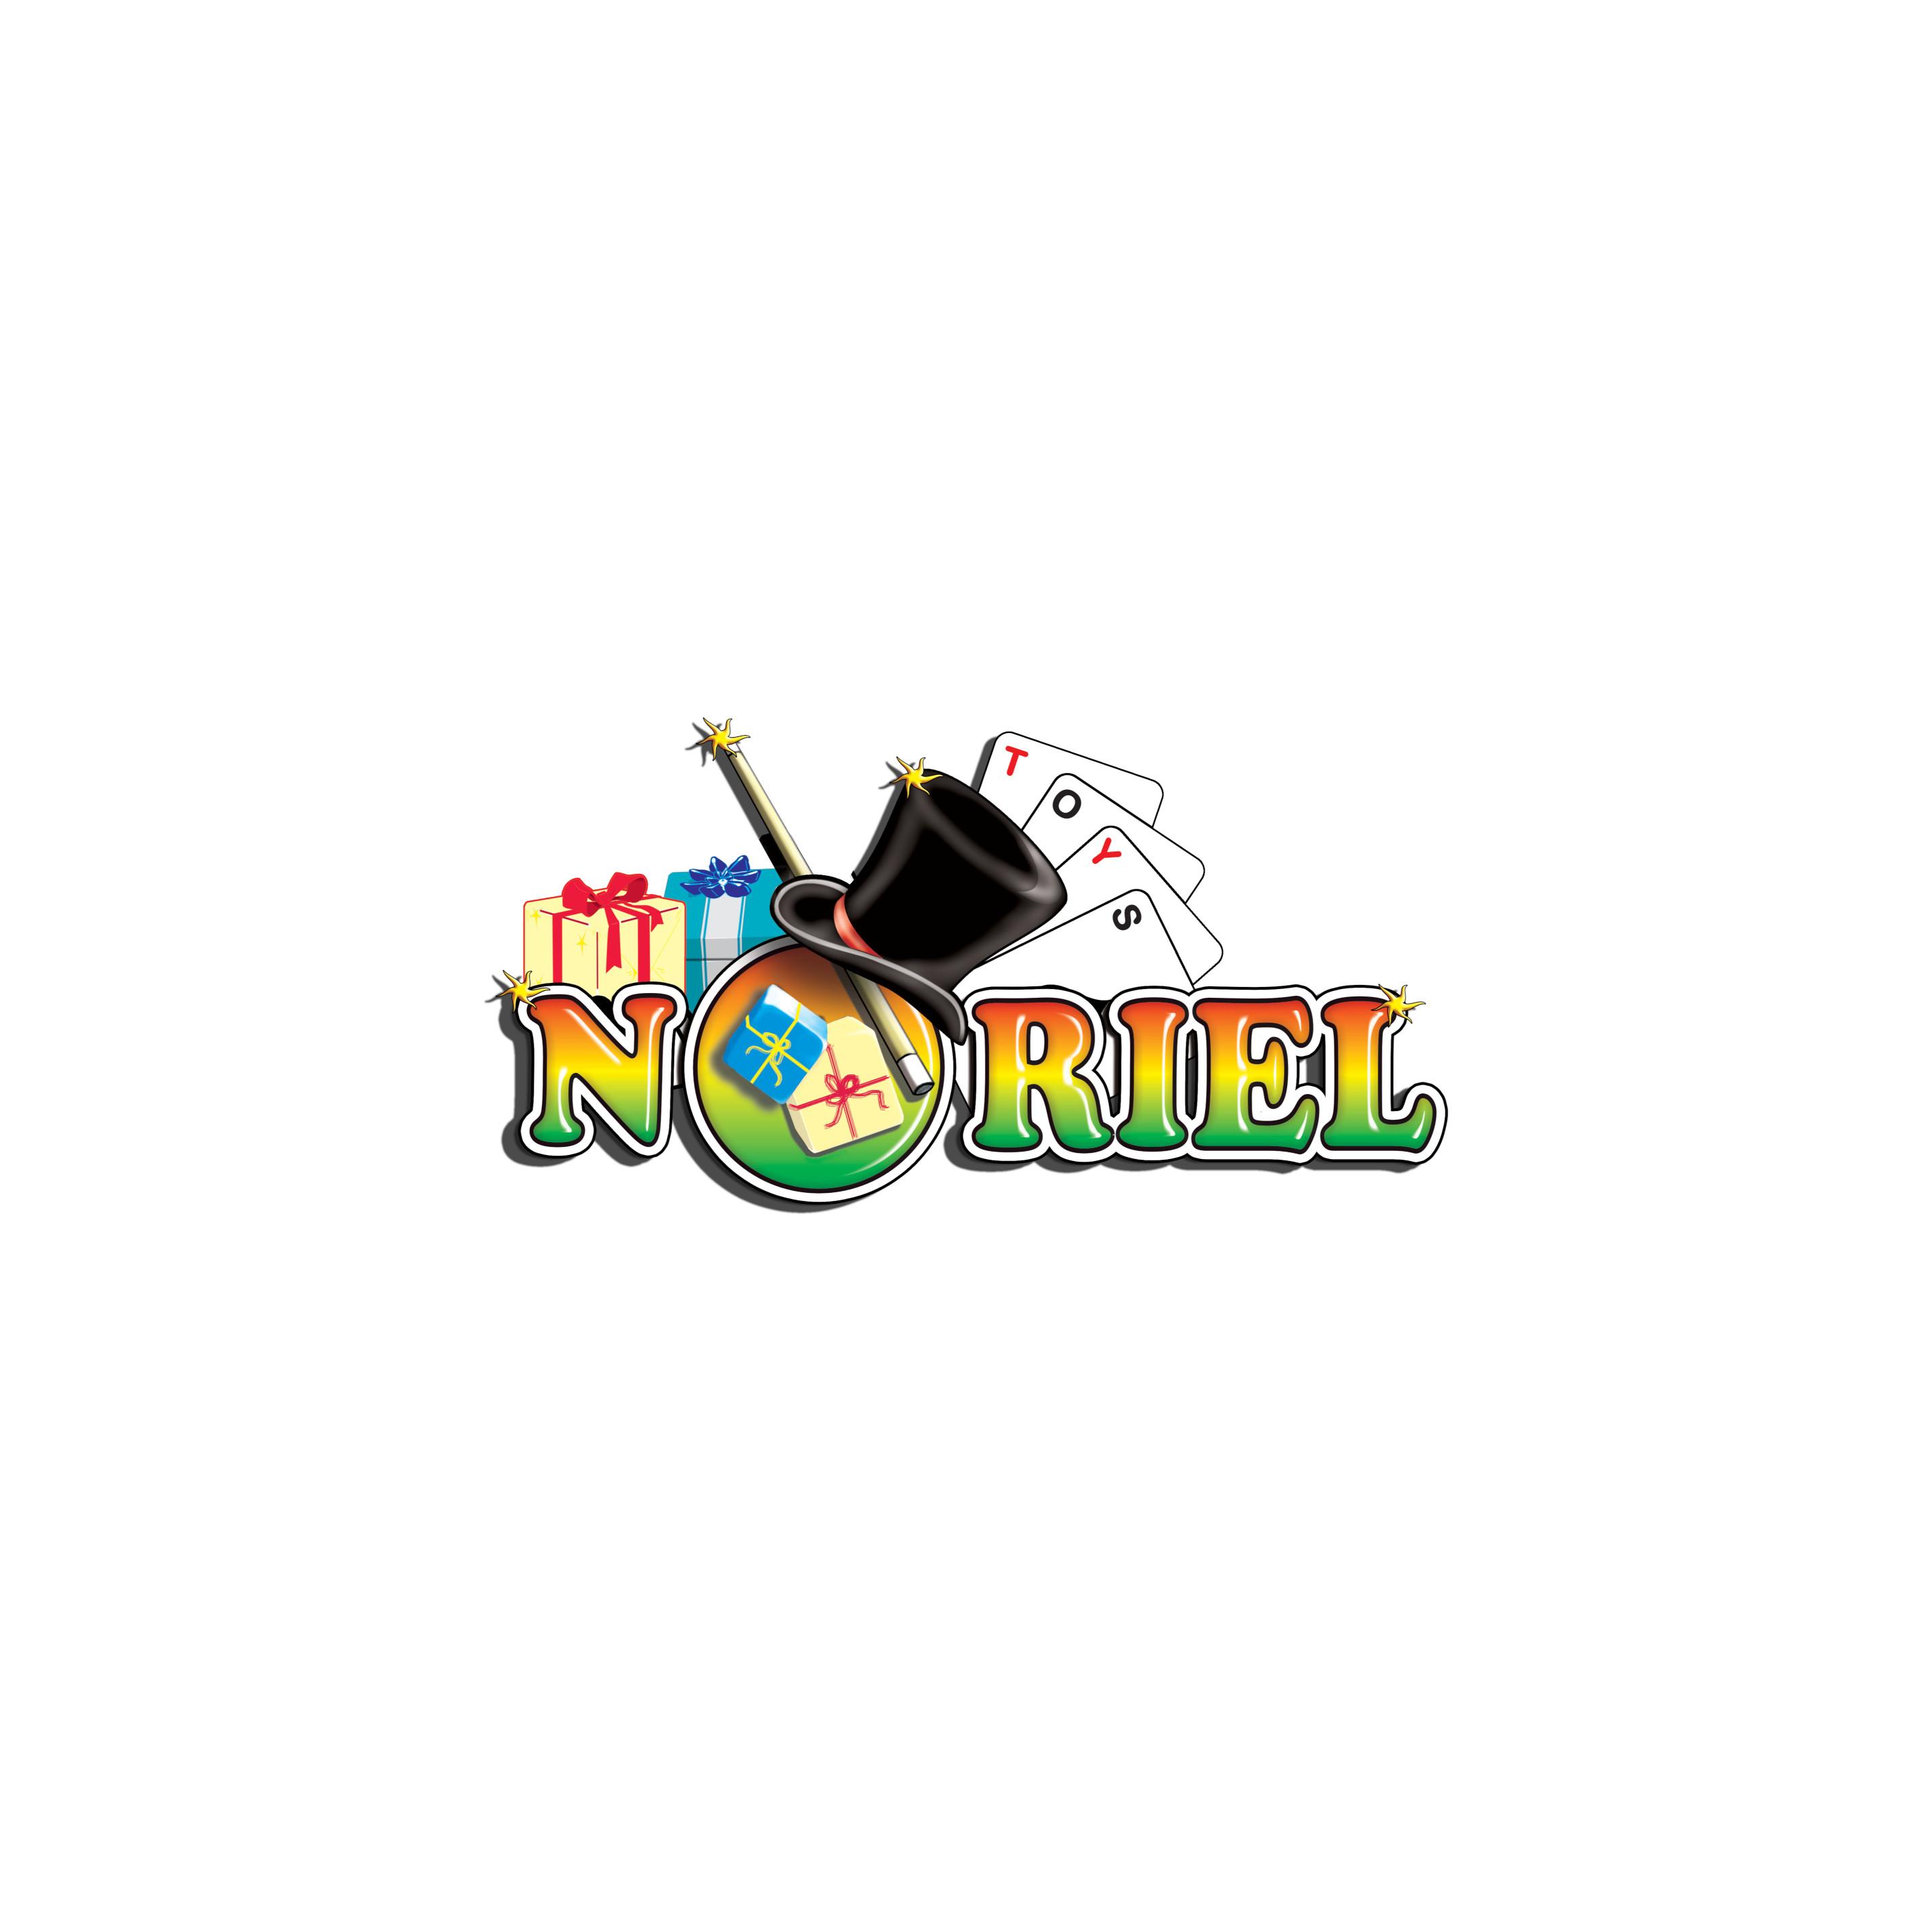 21572_2018_005w Masinuta Hot Wheels Monster Jam, NEA Police, FLX47